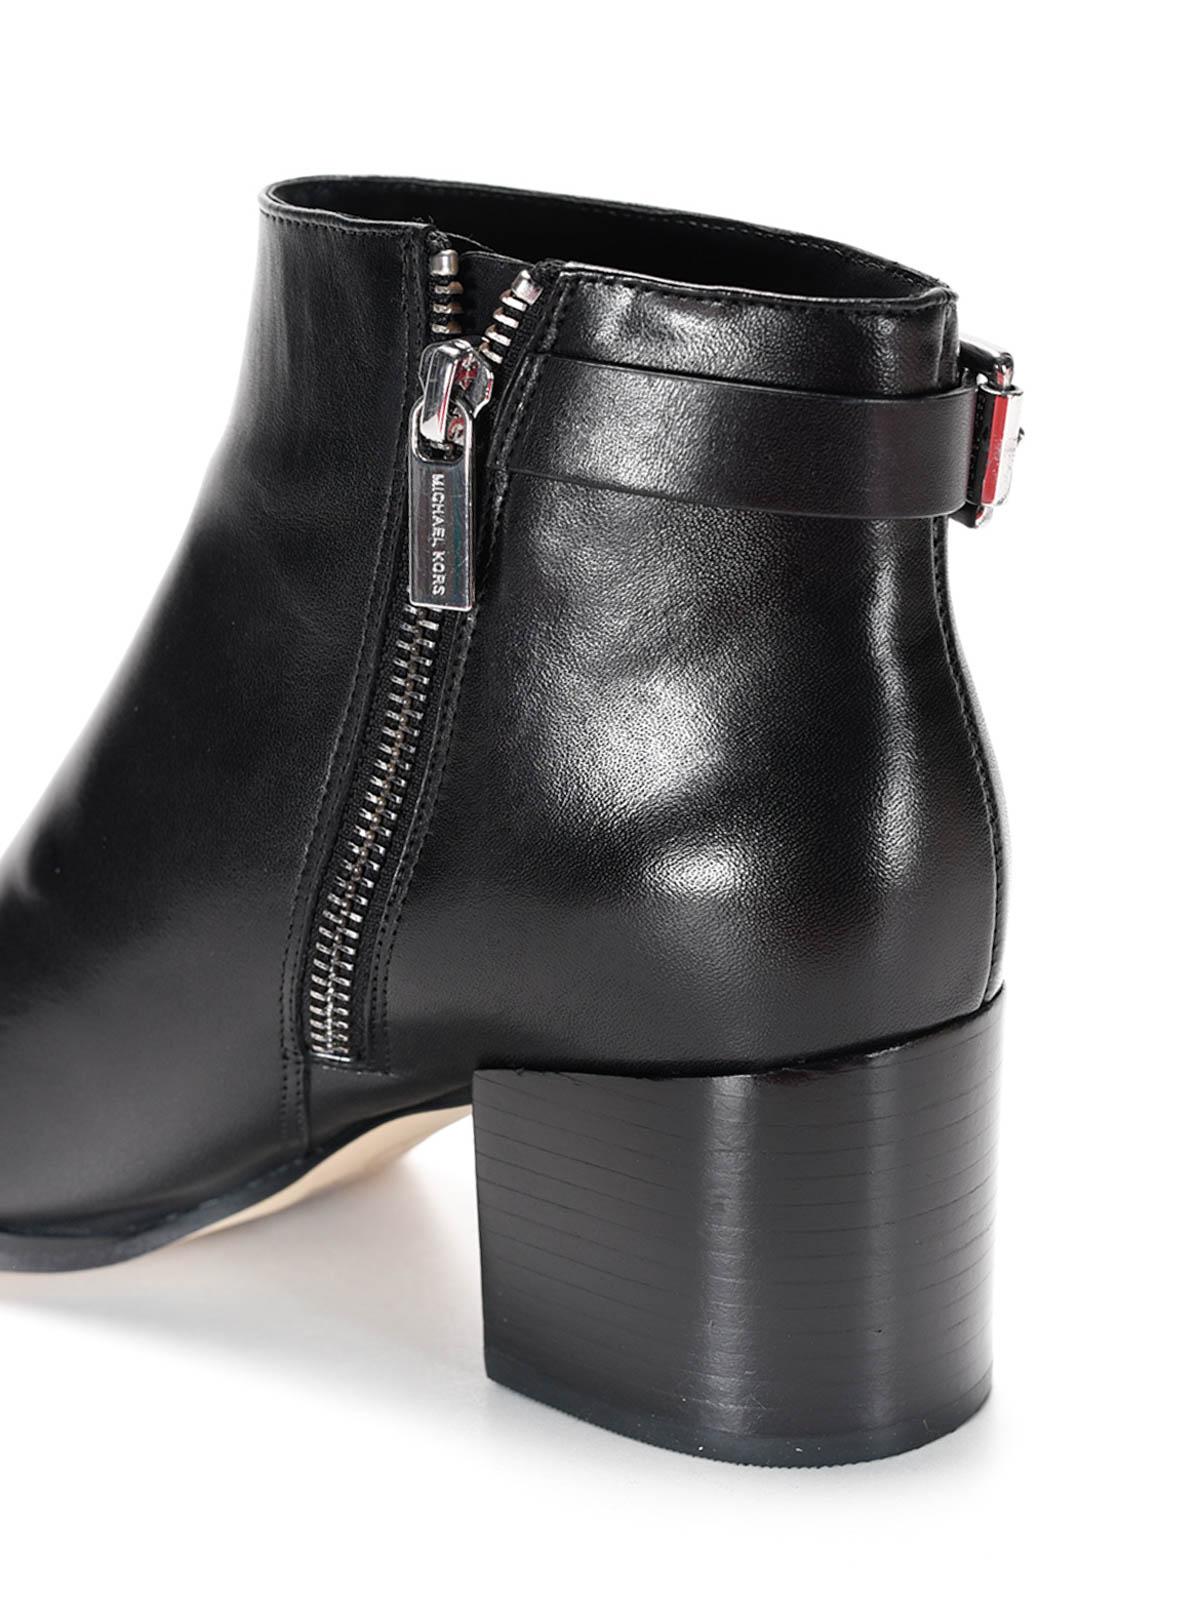 michael kors saylor leather ankle boots ankle boots. Black Bedroom Furniture Sets. Home Design Ideas